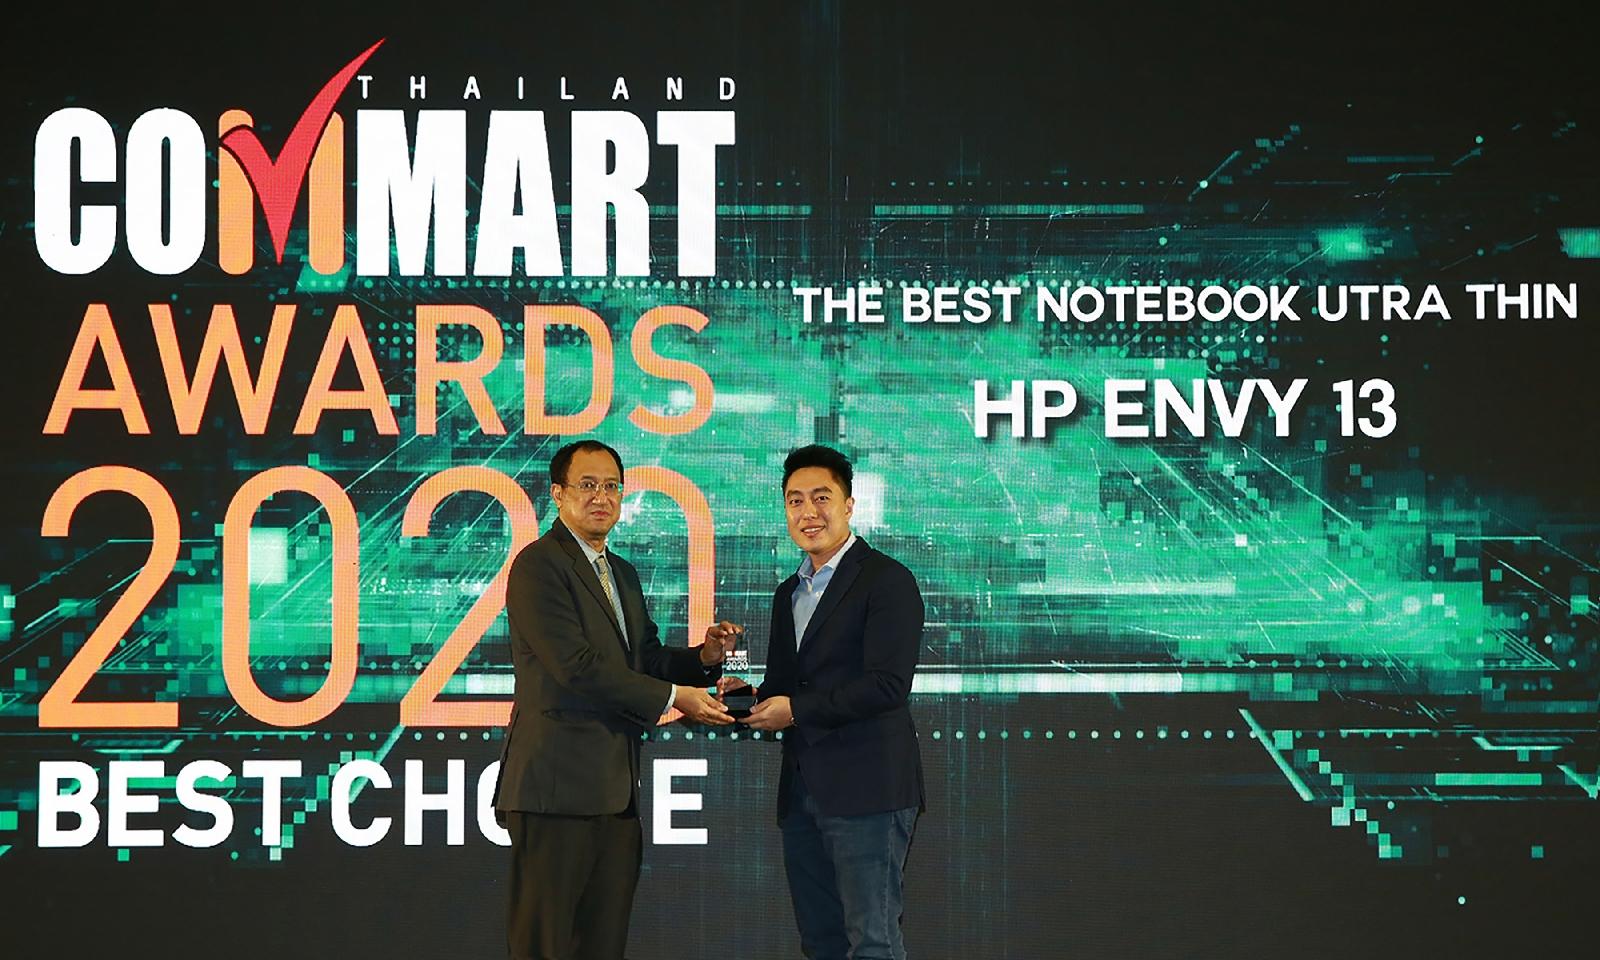 HP รับรางวัล The Best Notebook Ultra-thin ในงาน COMMART AWARDS 2020